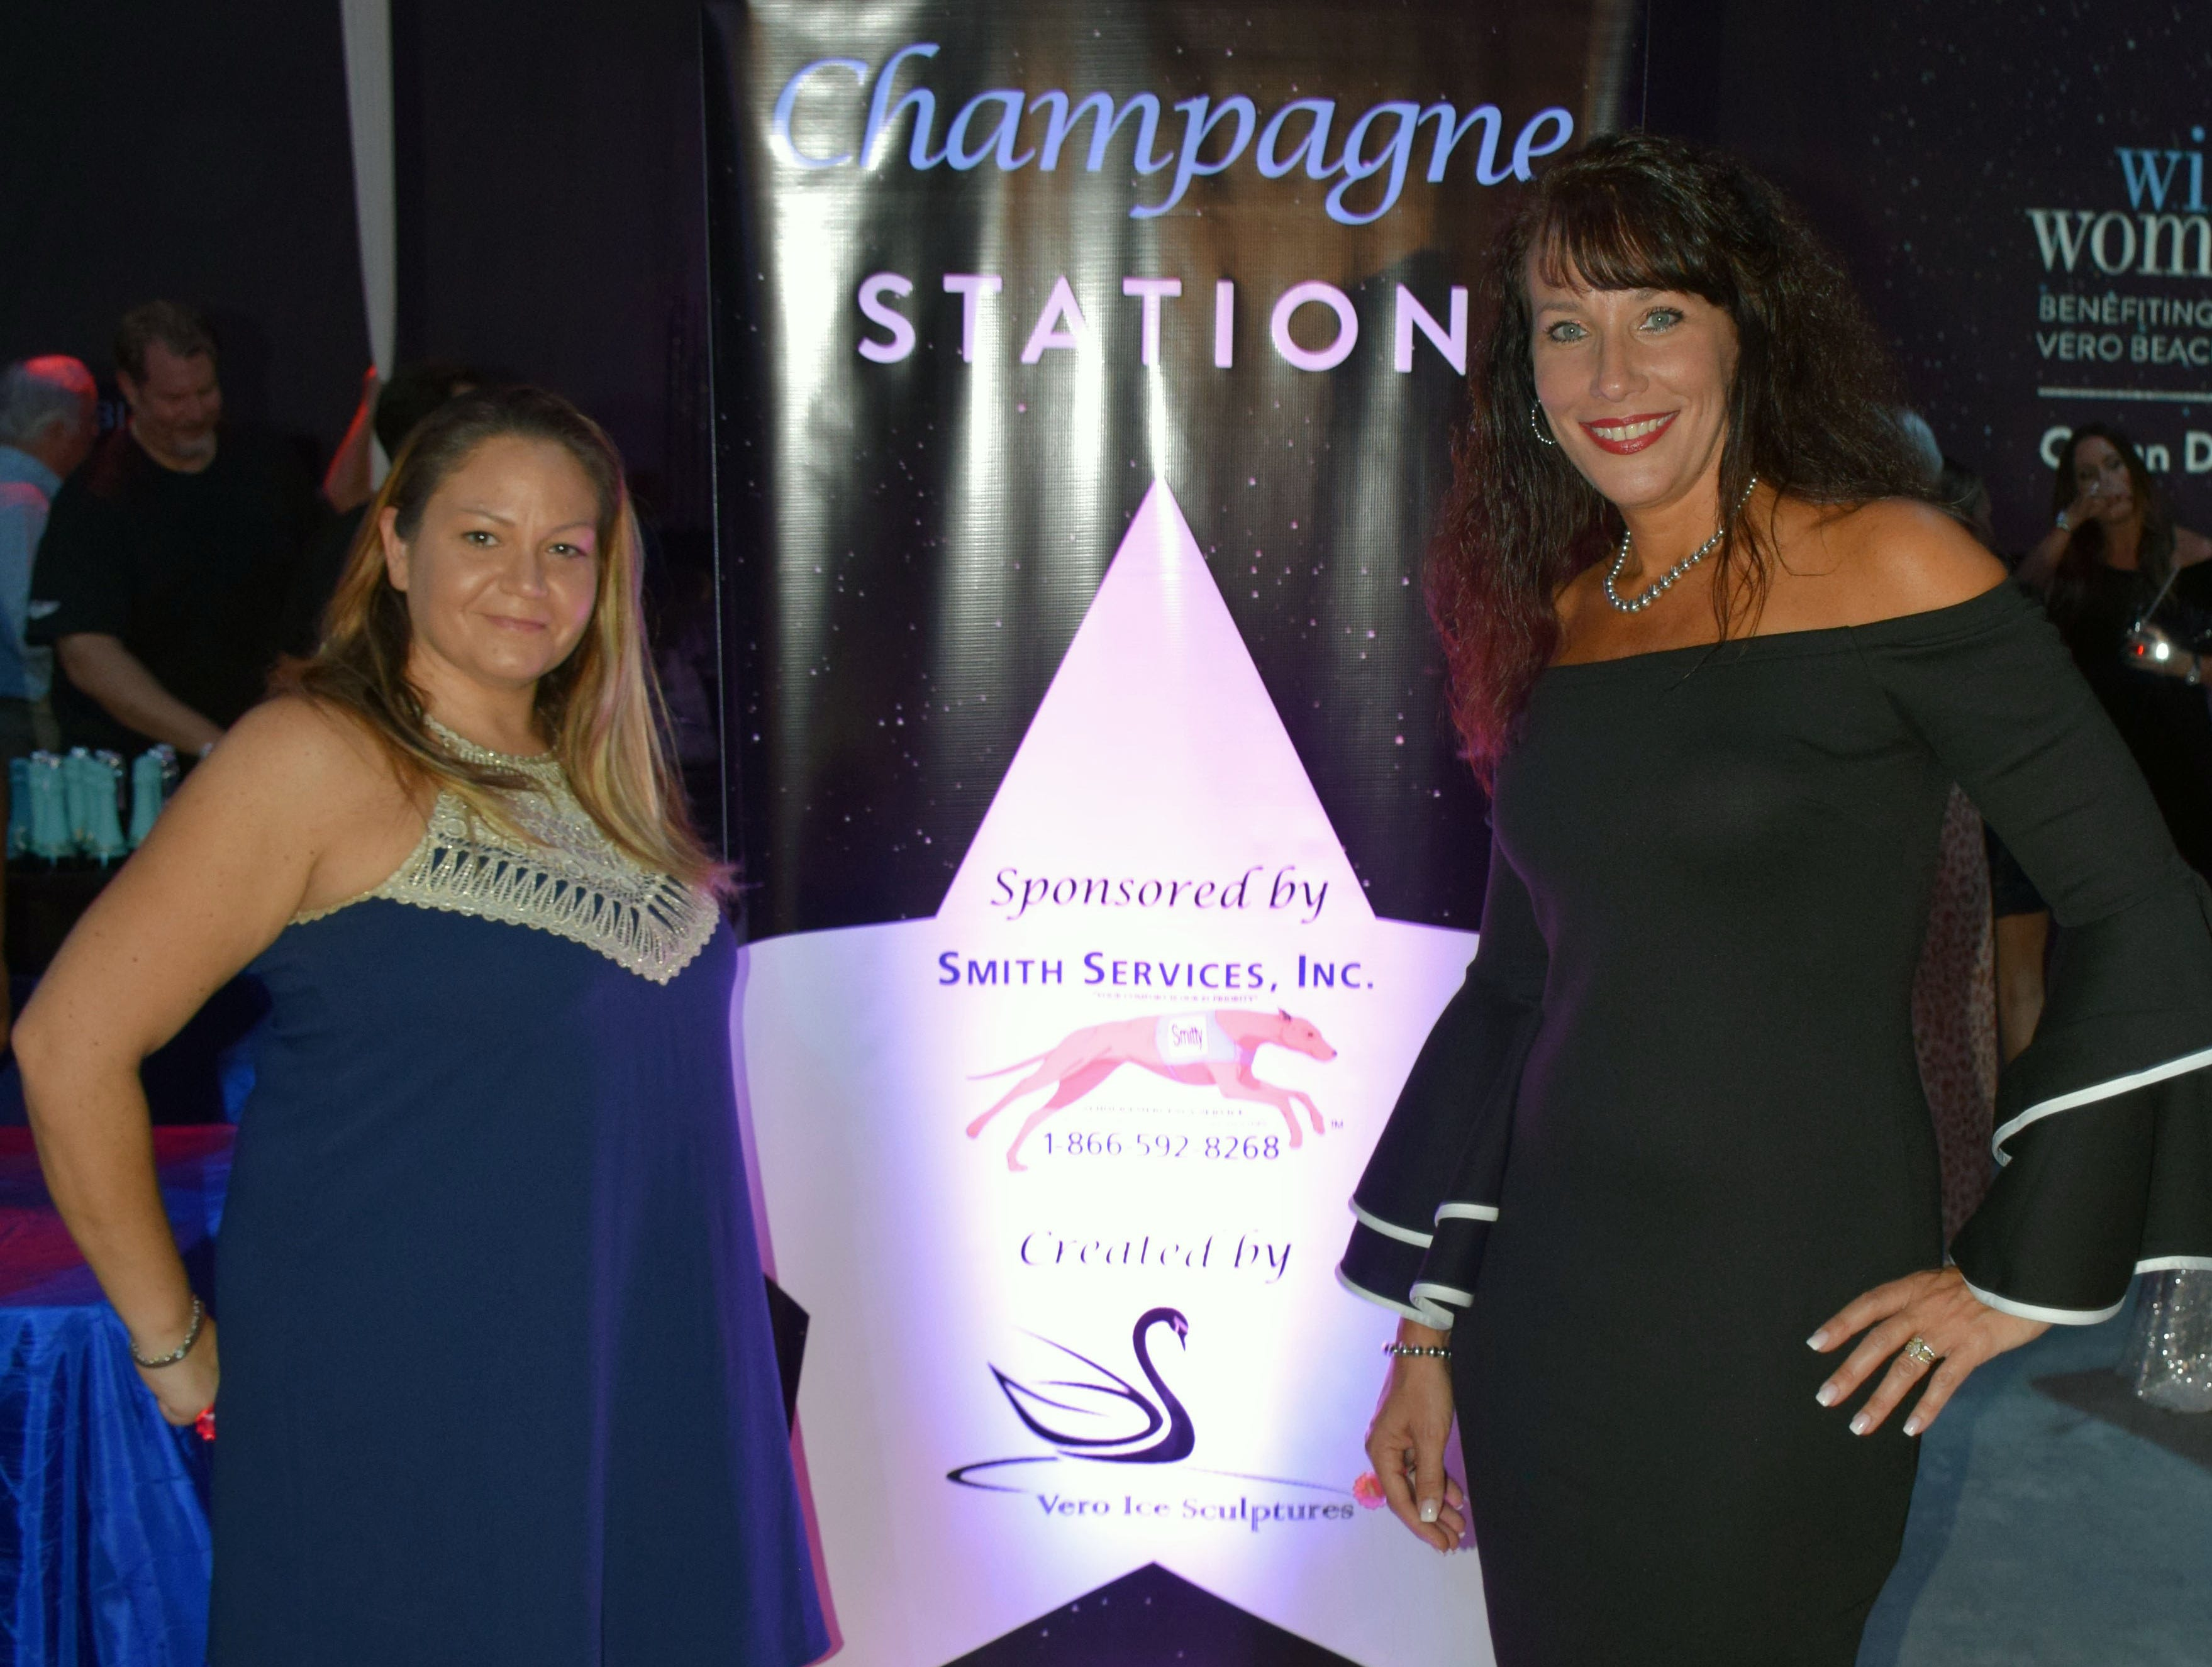 Sponsors Frances Brown and Kristine DeBlasio